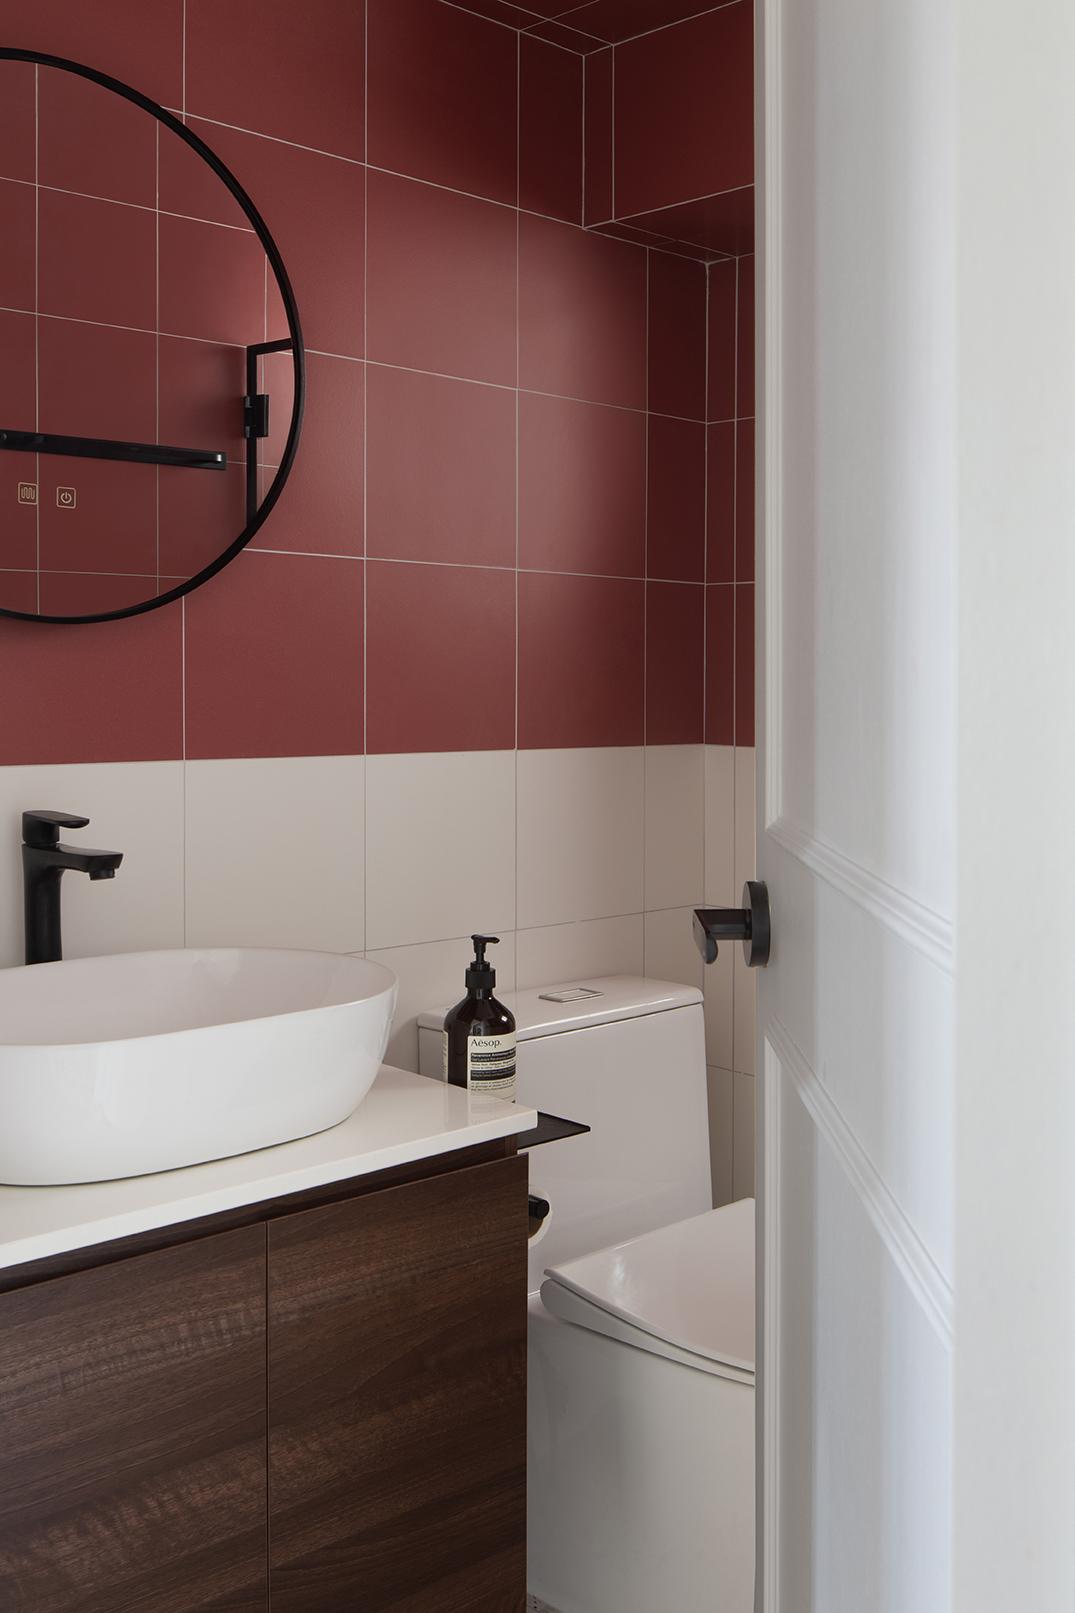 Ascend Design Interior Boon Tiong Rd bathroom